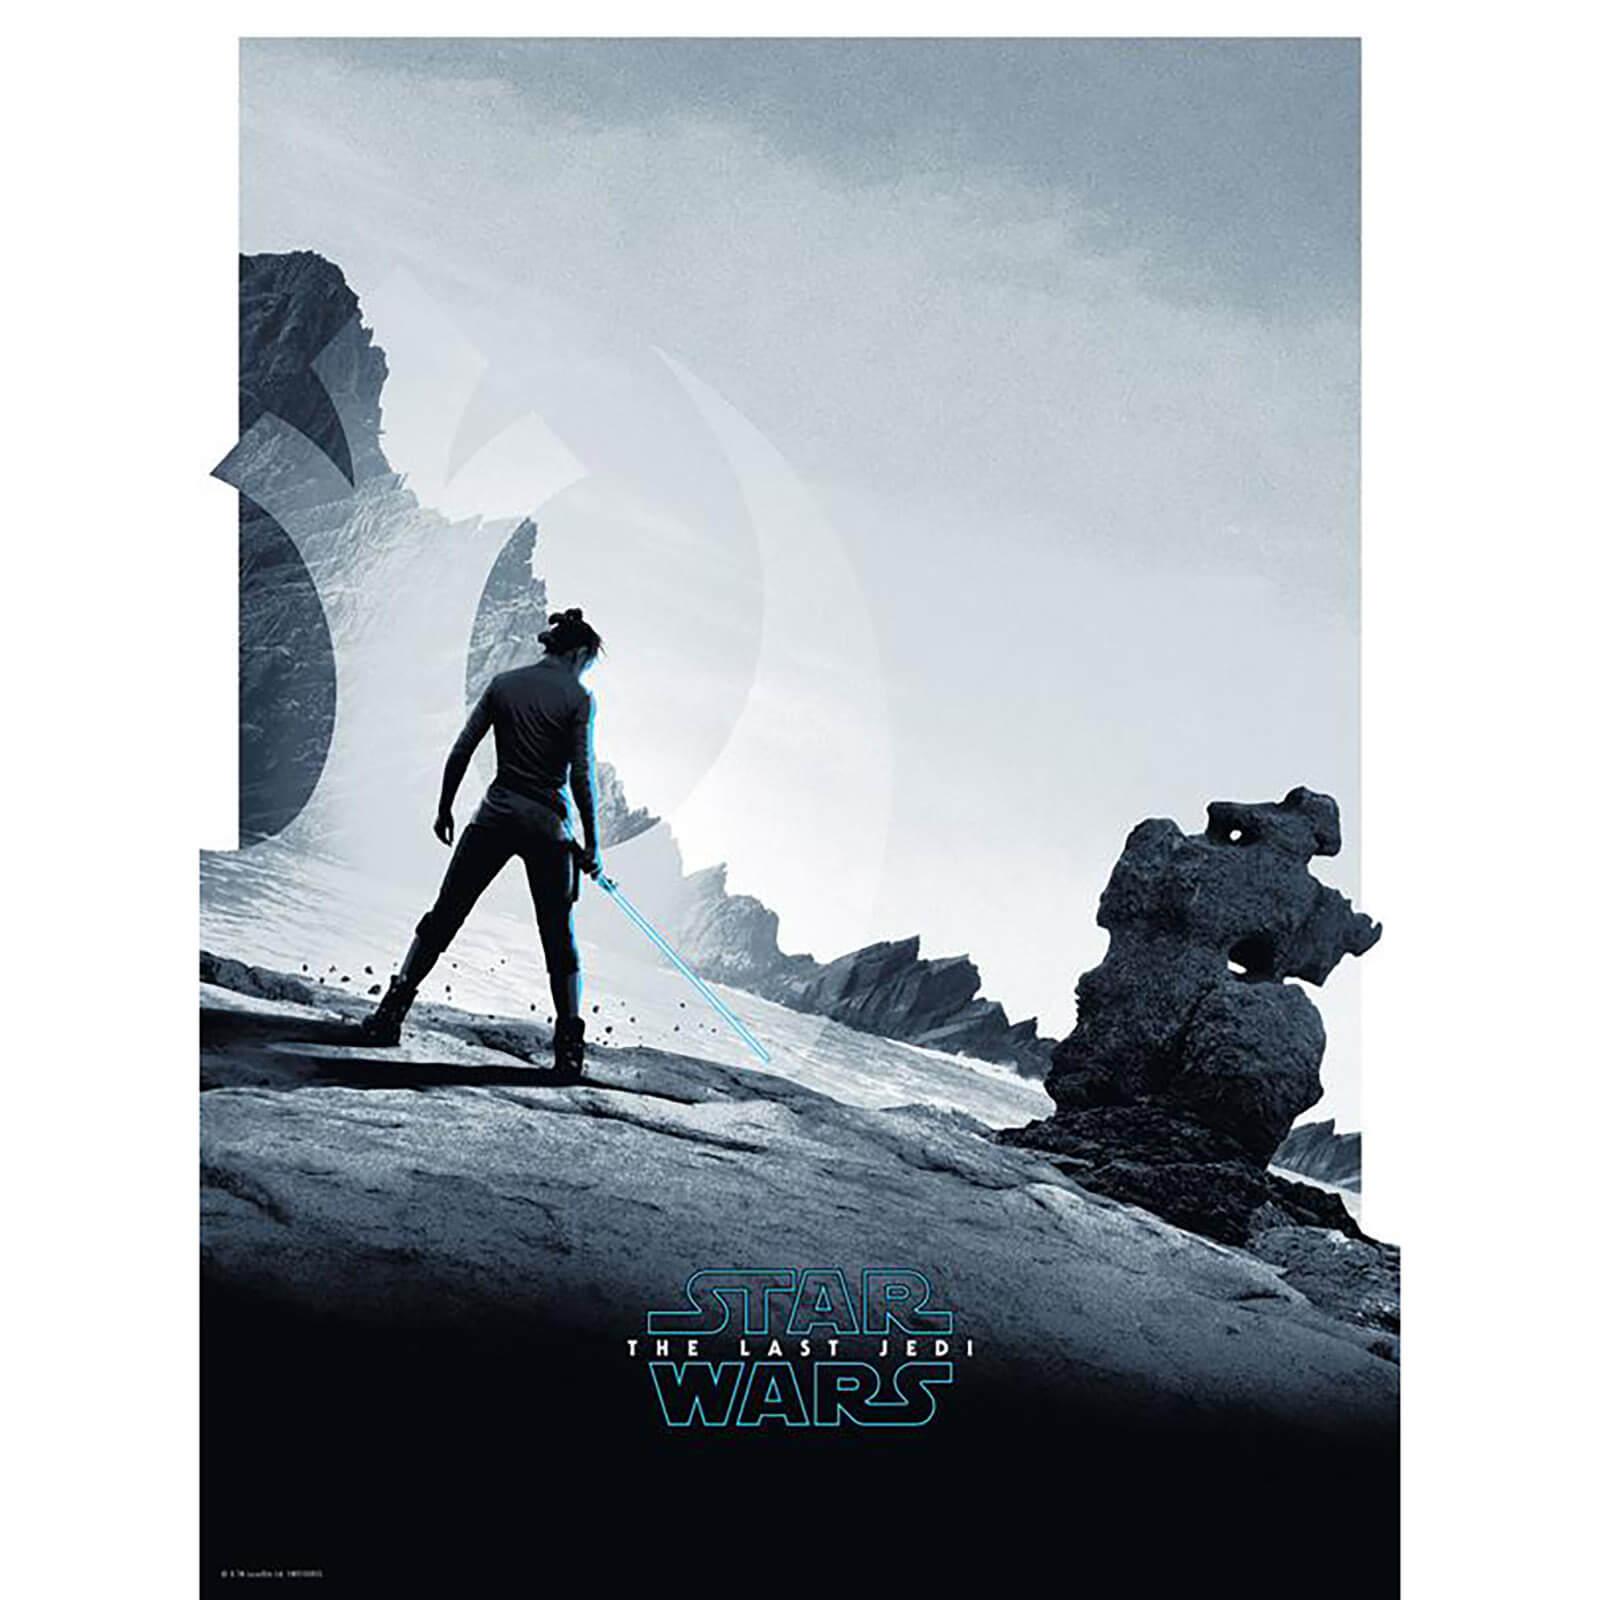 ACME Star Wars The Last Jedi  Rey  18x24 Screenprint by Matt Ferguson - Zavvi UK Exclusive